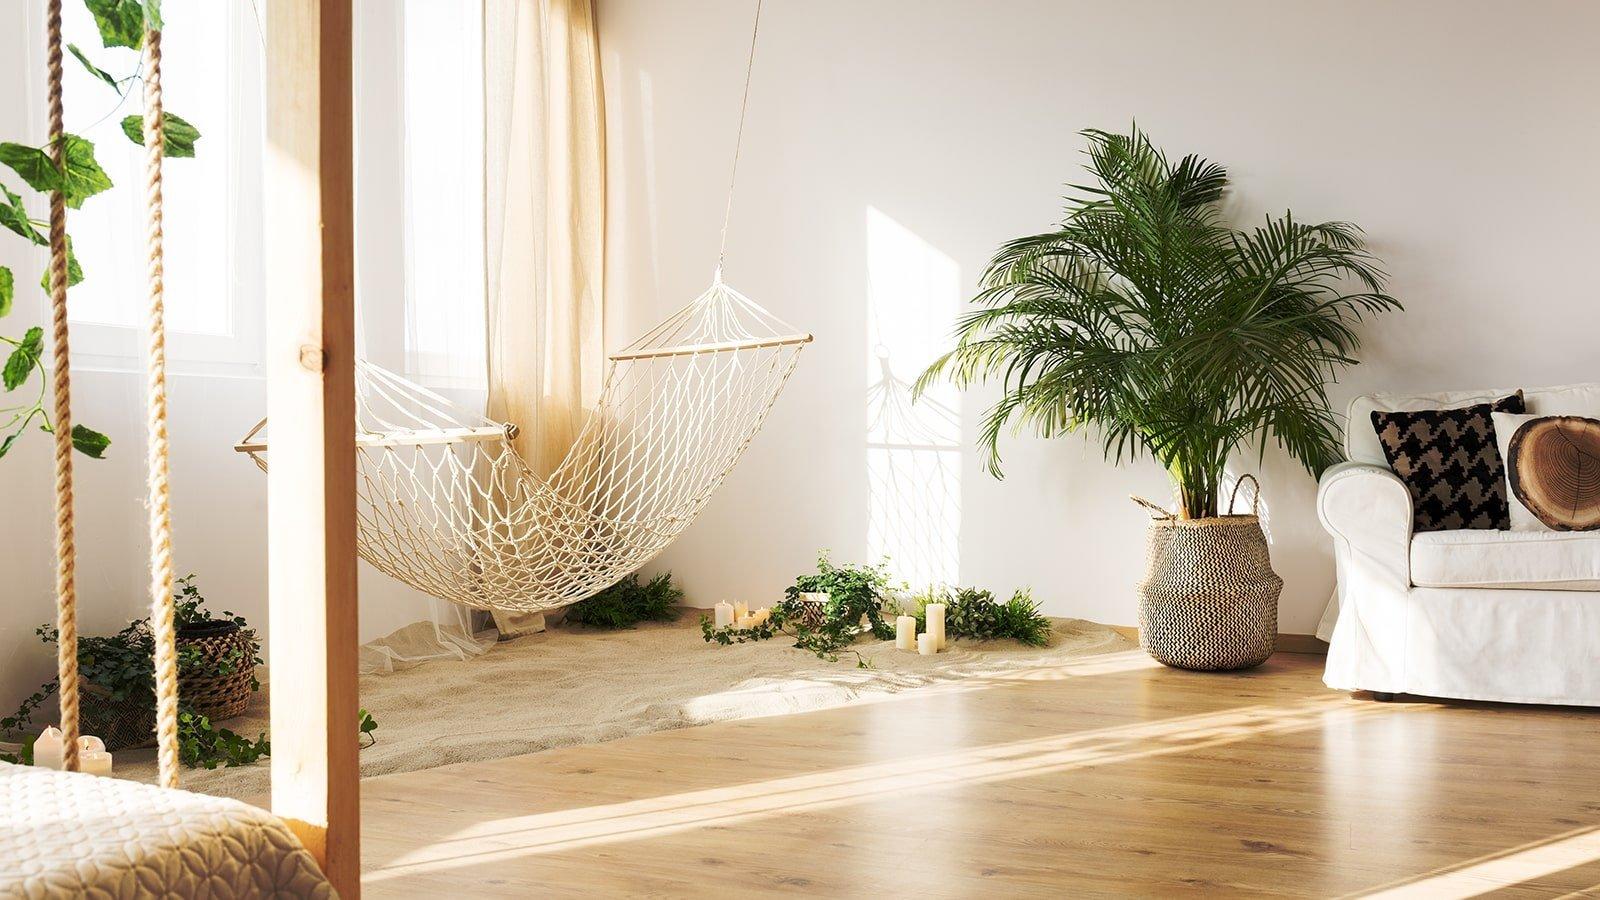 Quiet Cozy Room